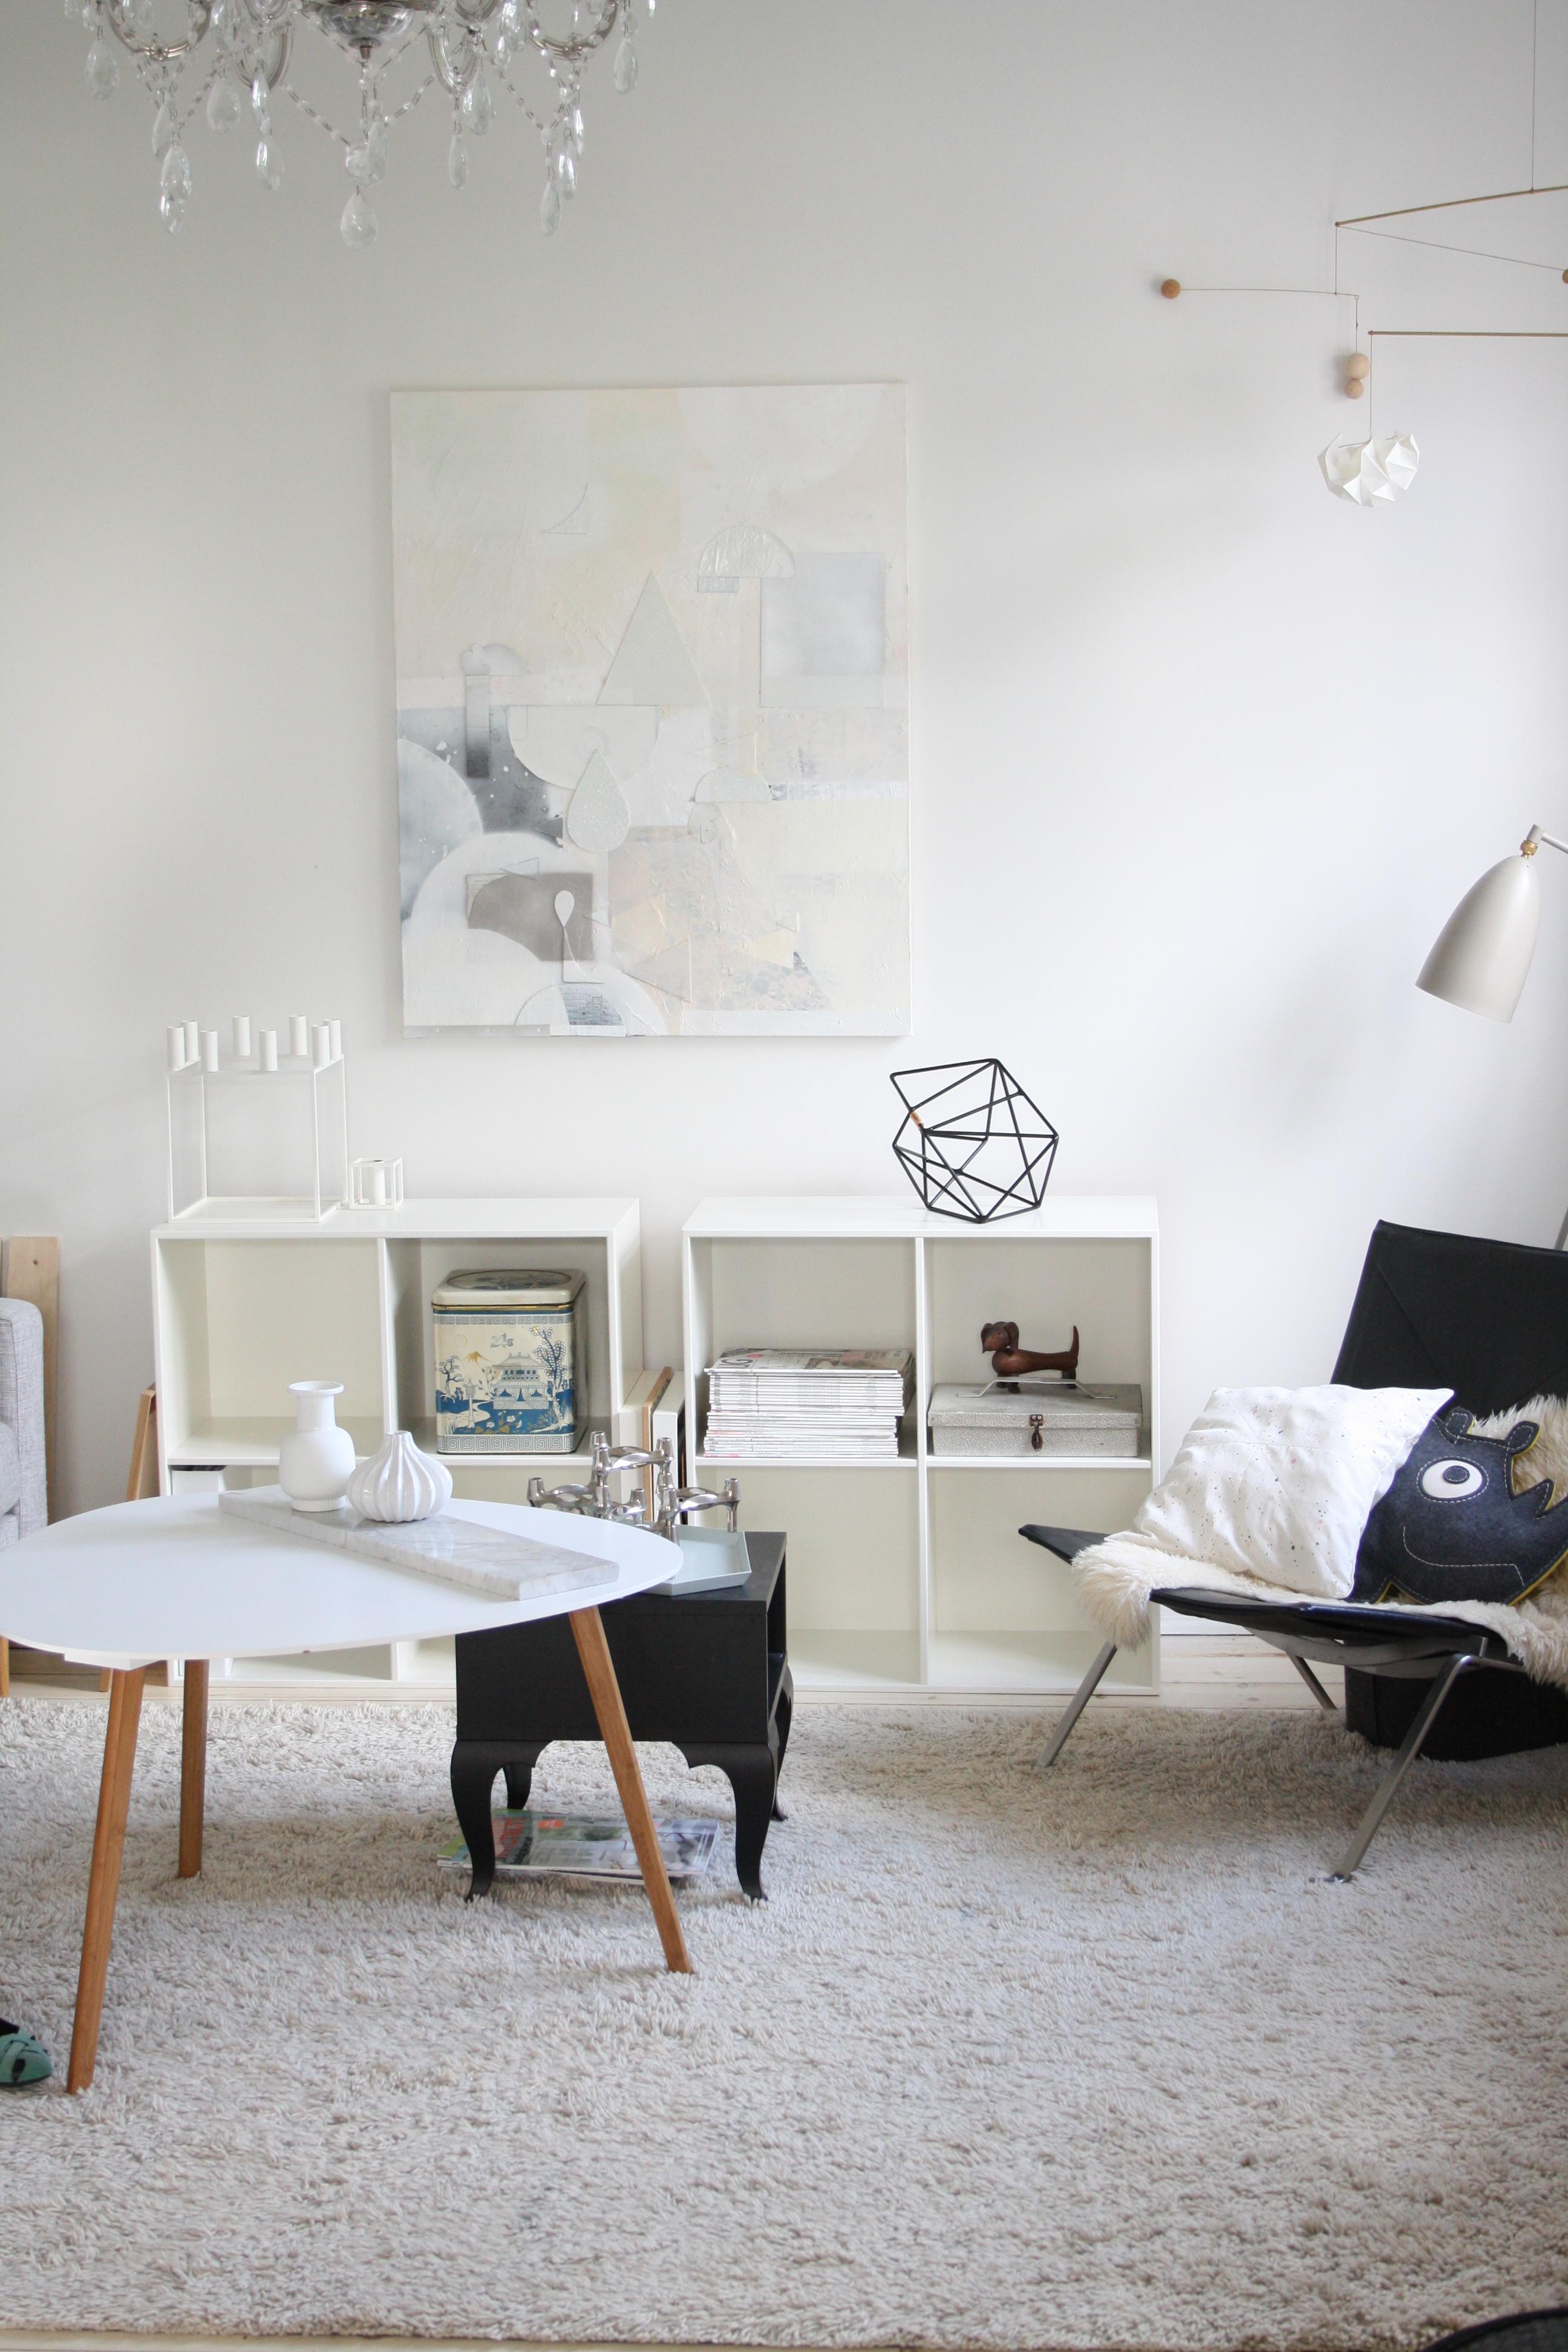 ny stue_bolig_indretning_makeover_1